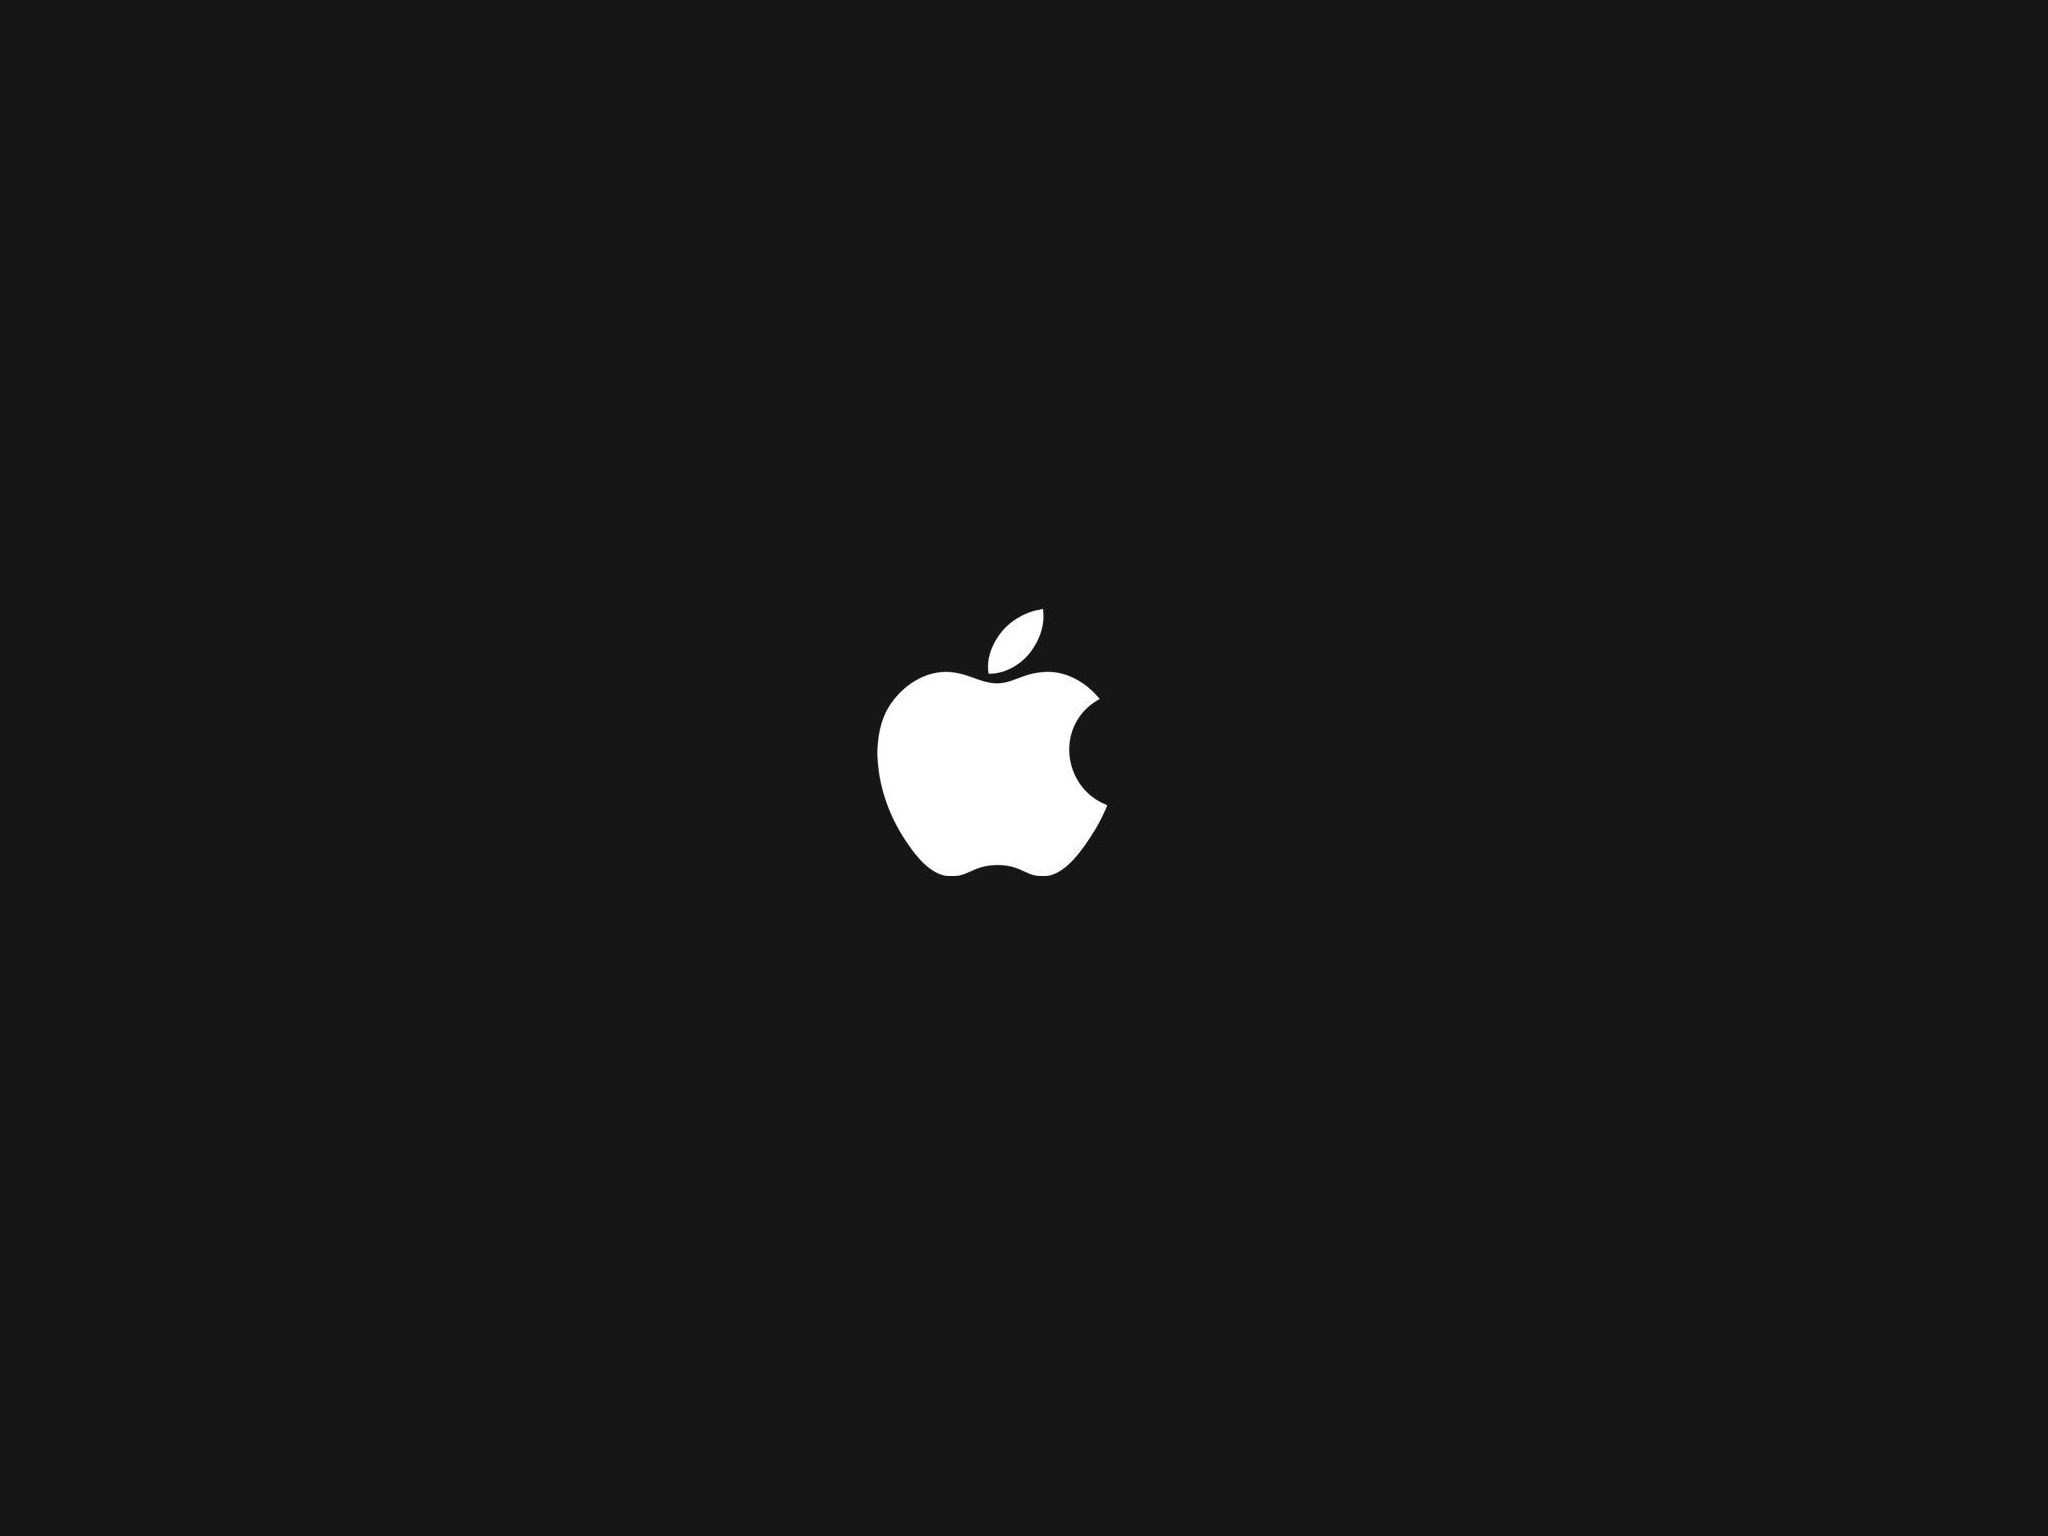 Black Apple Wallpaper Full Hd All Phone Wallpaper Hd